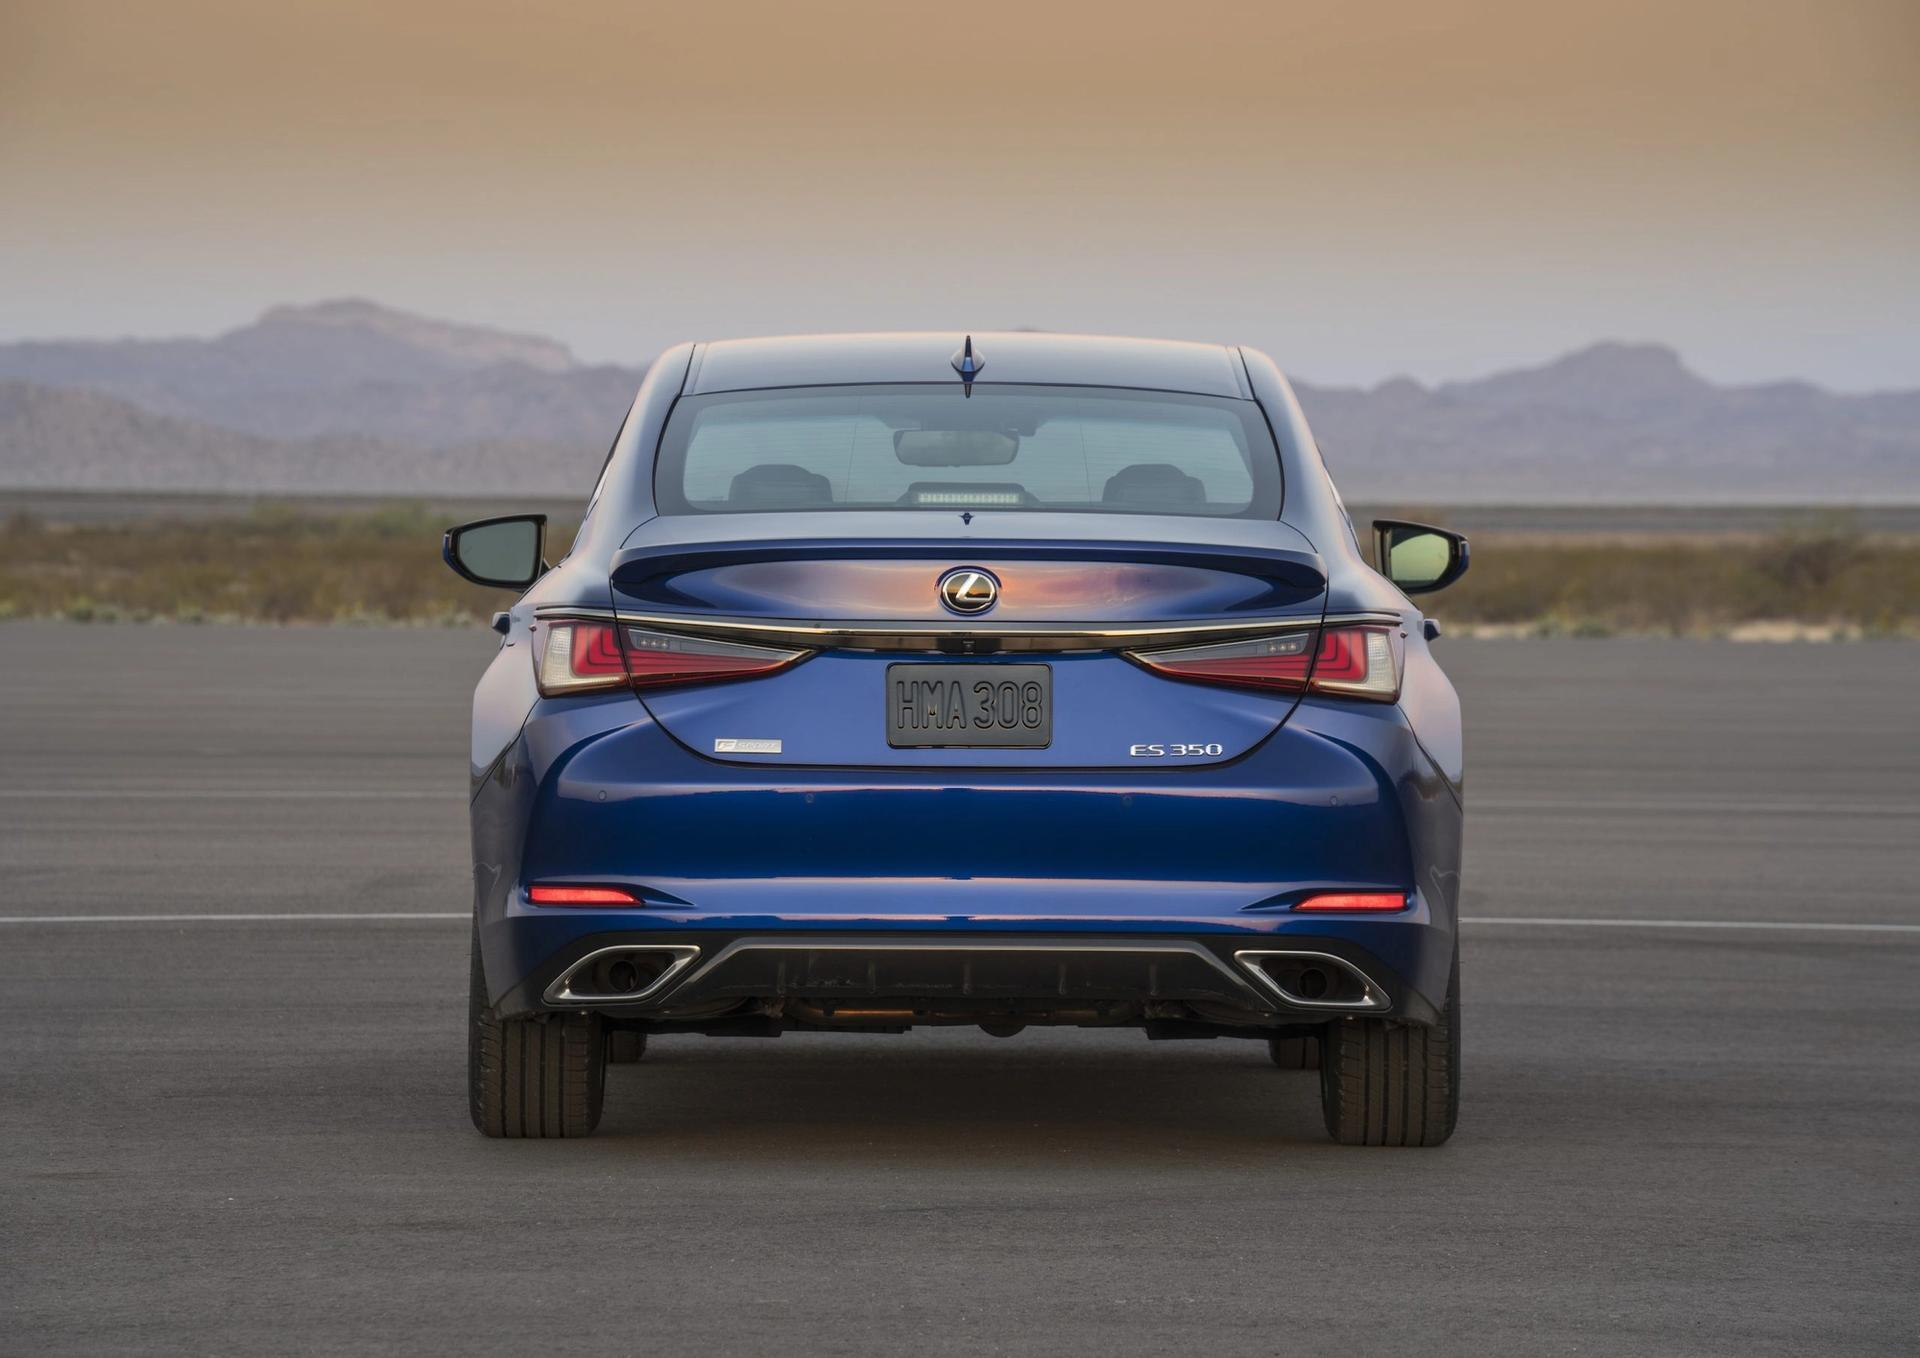 Lexus ES rear view